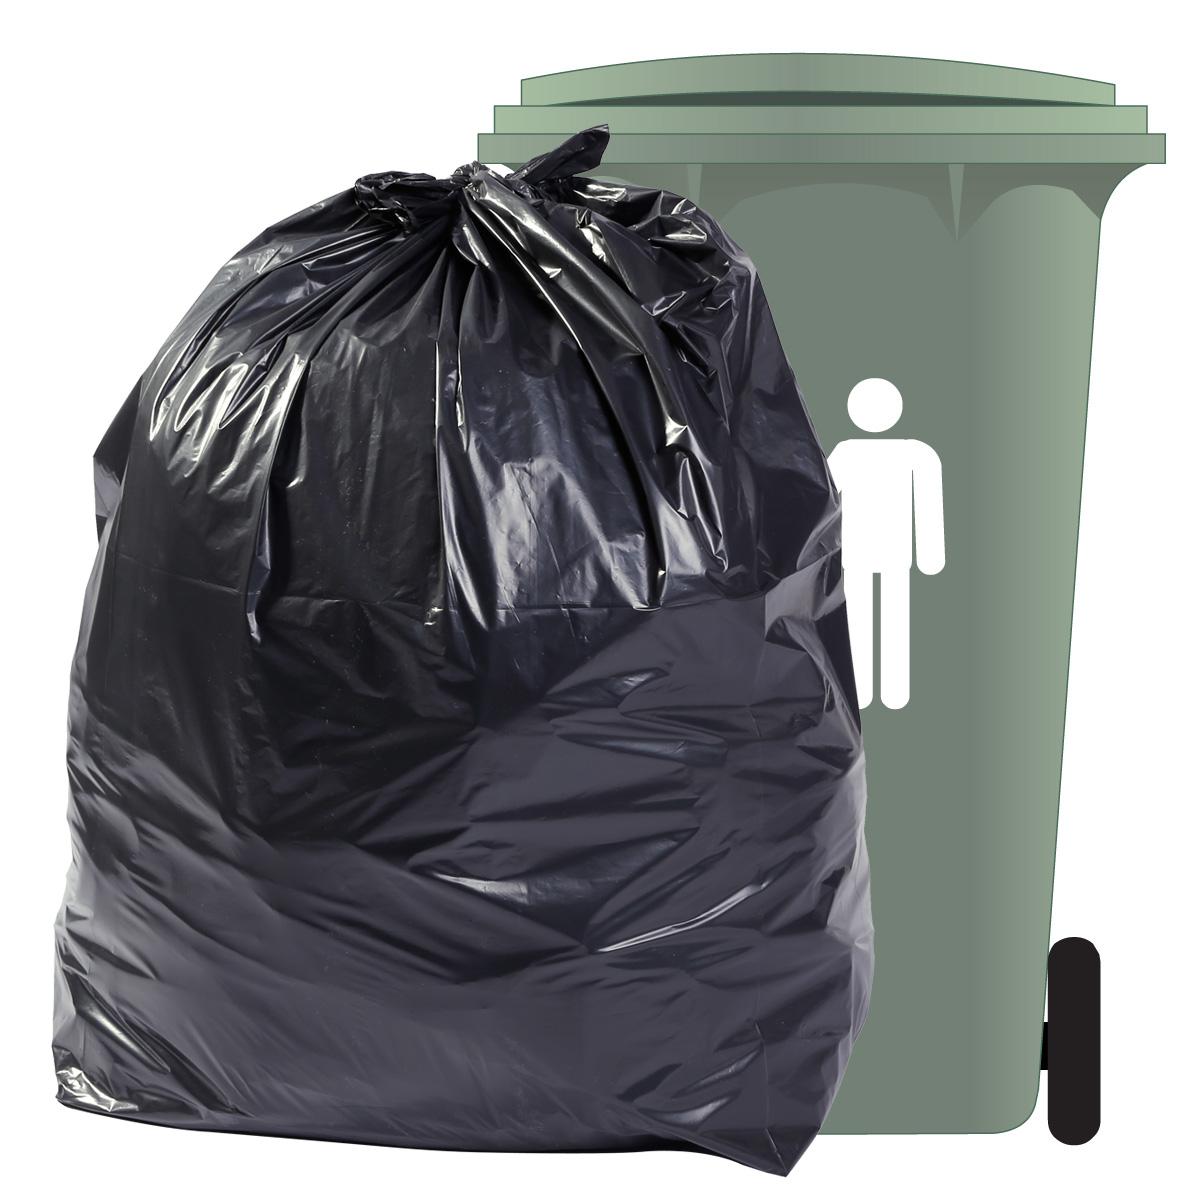 REFUSE-BAGS-SACKS-BIN-LINERS-RUBBISH-BAG-Kitchen-Toilet-Waste-Trash-Bags